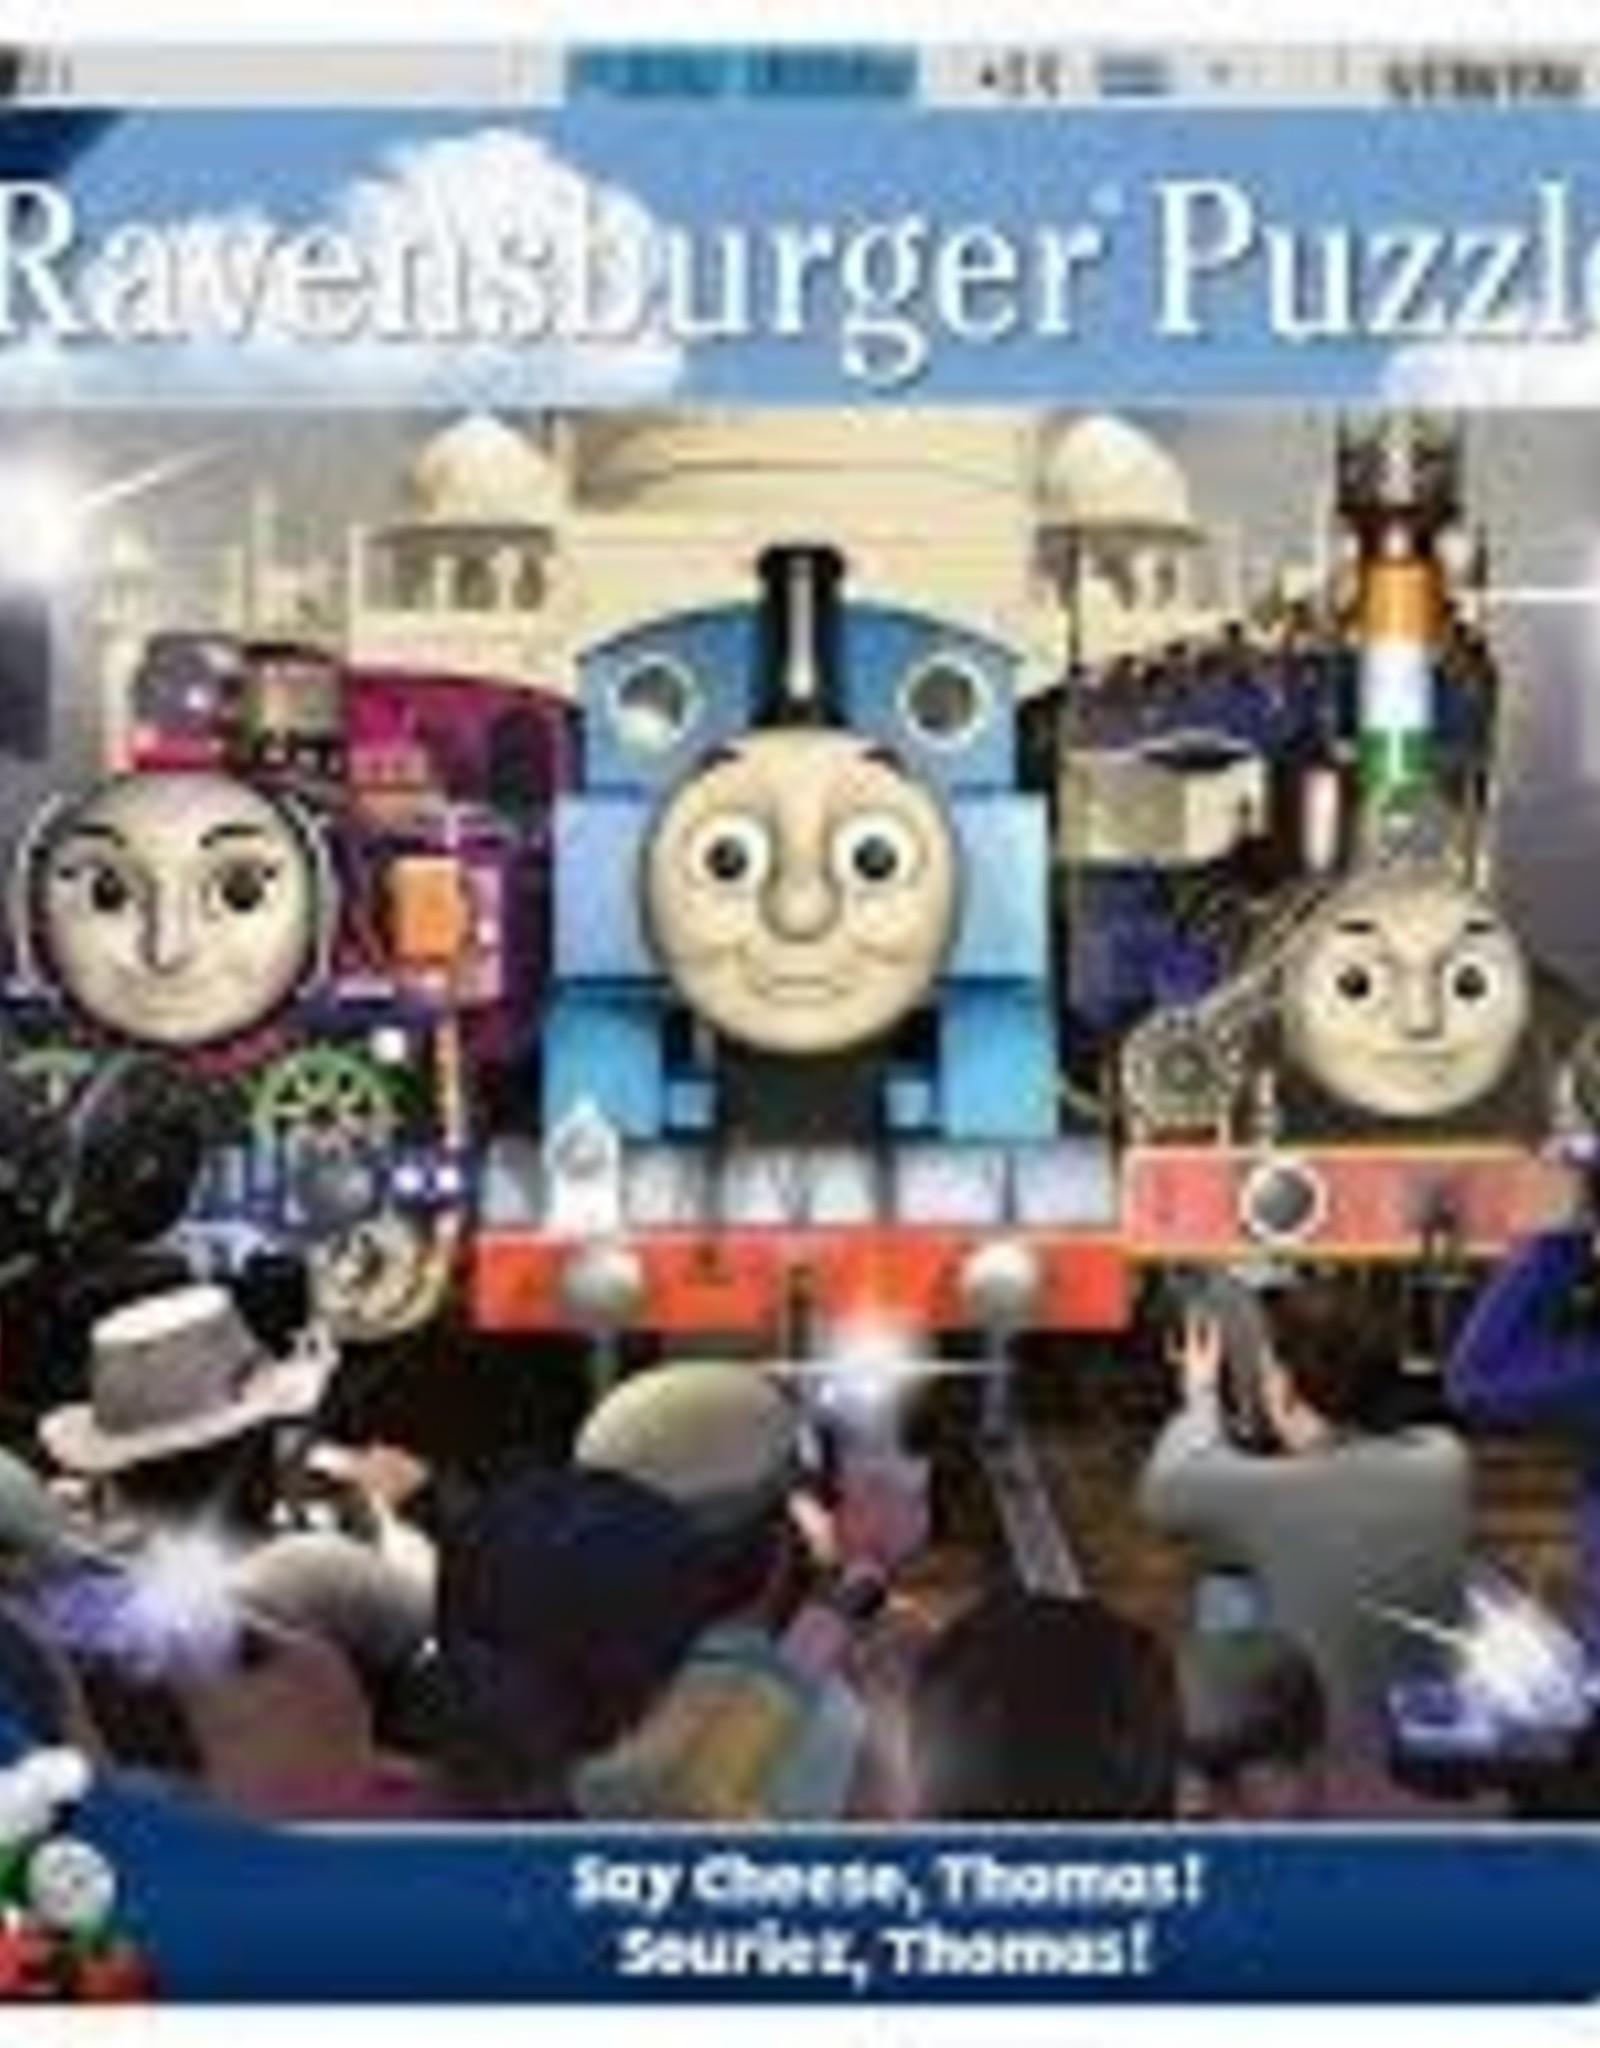 Ravensburger 100pc XXL puzzle Say Cheese, Thomas!